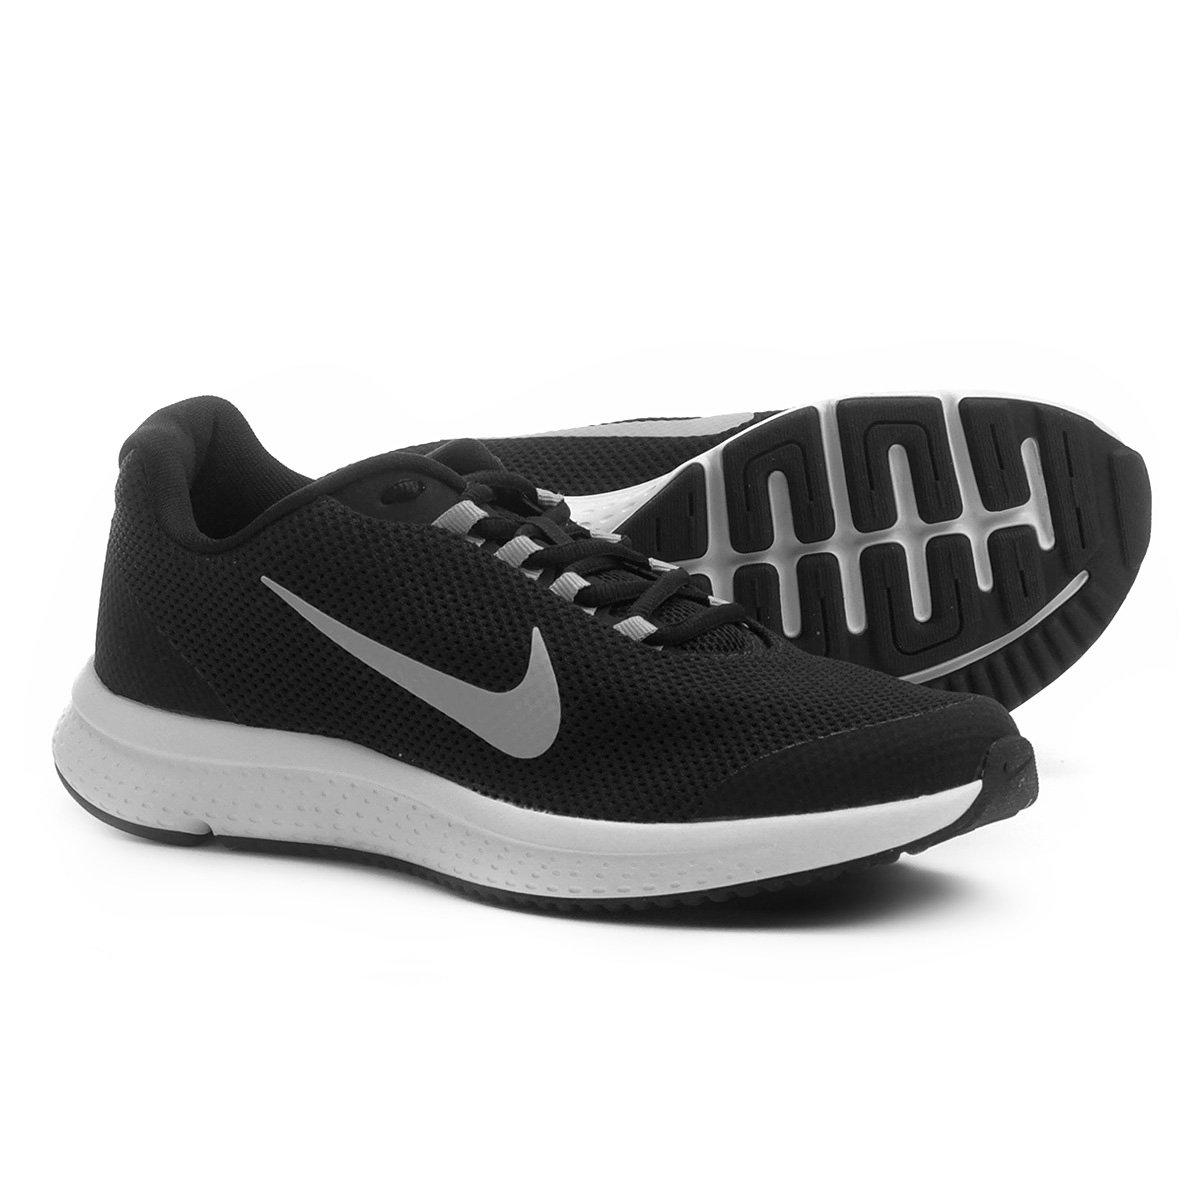 9d431313c Tênis Nike Runallday Masculino - Preto e Branco - Compre Agora ...